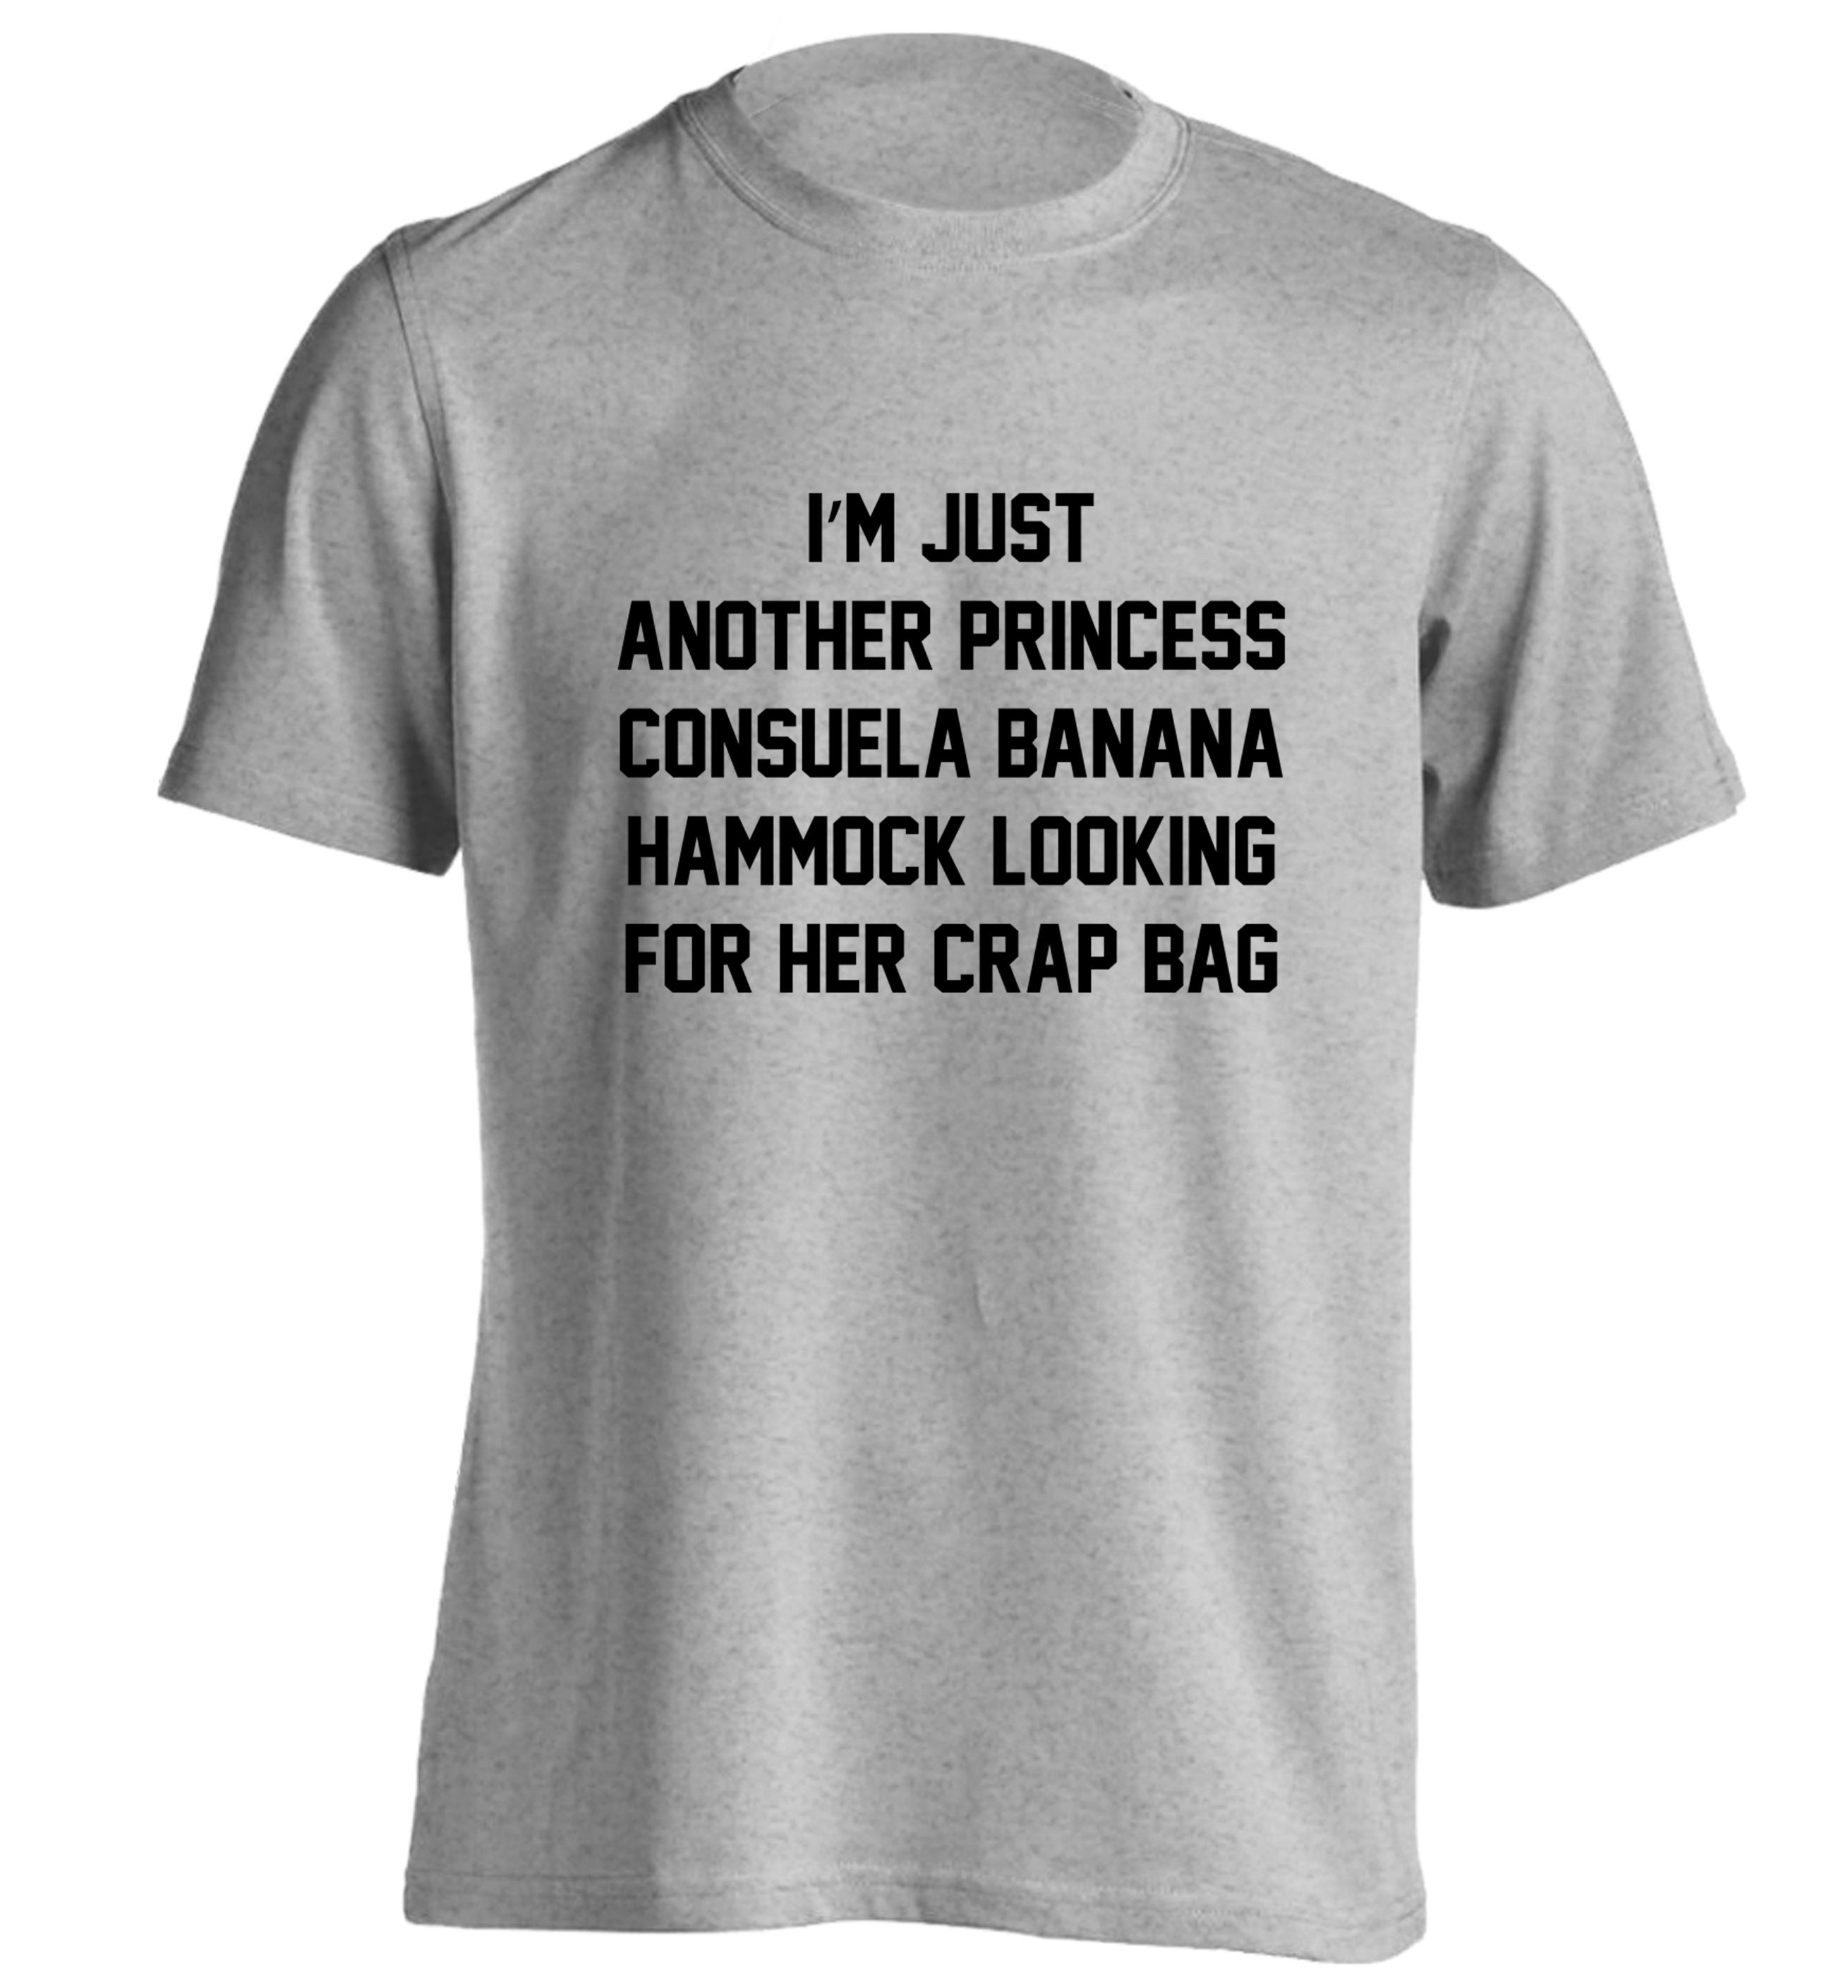 I M Just Another Princess Consuela Banana Hammock Looking For Her Crap Bag T Shirt Friends